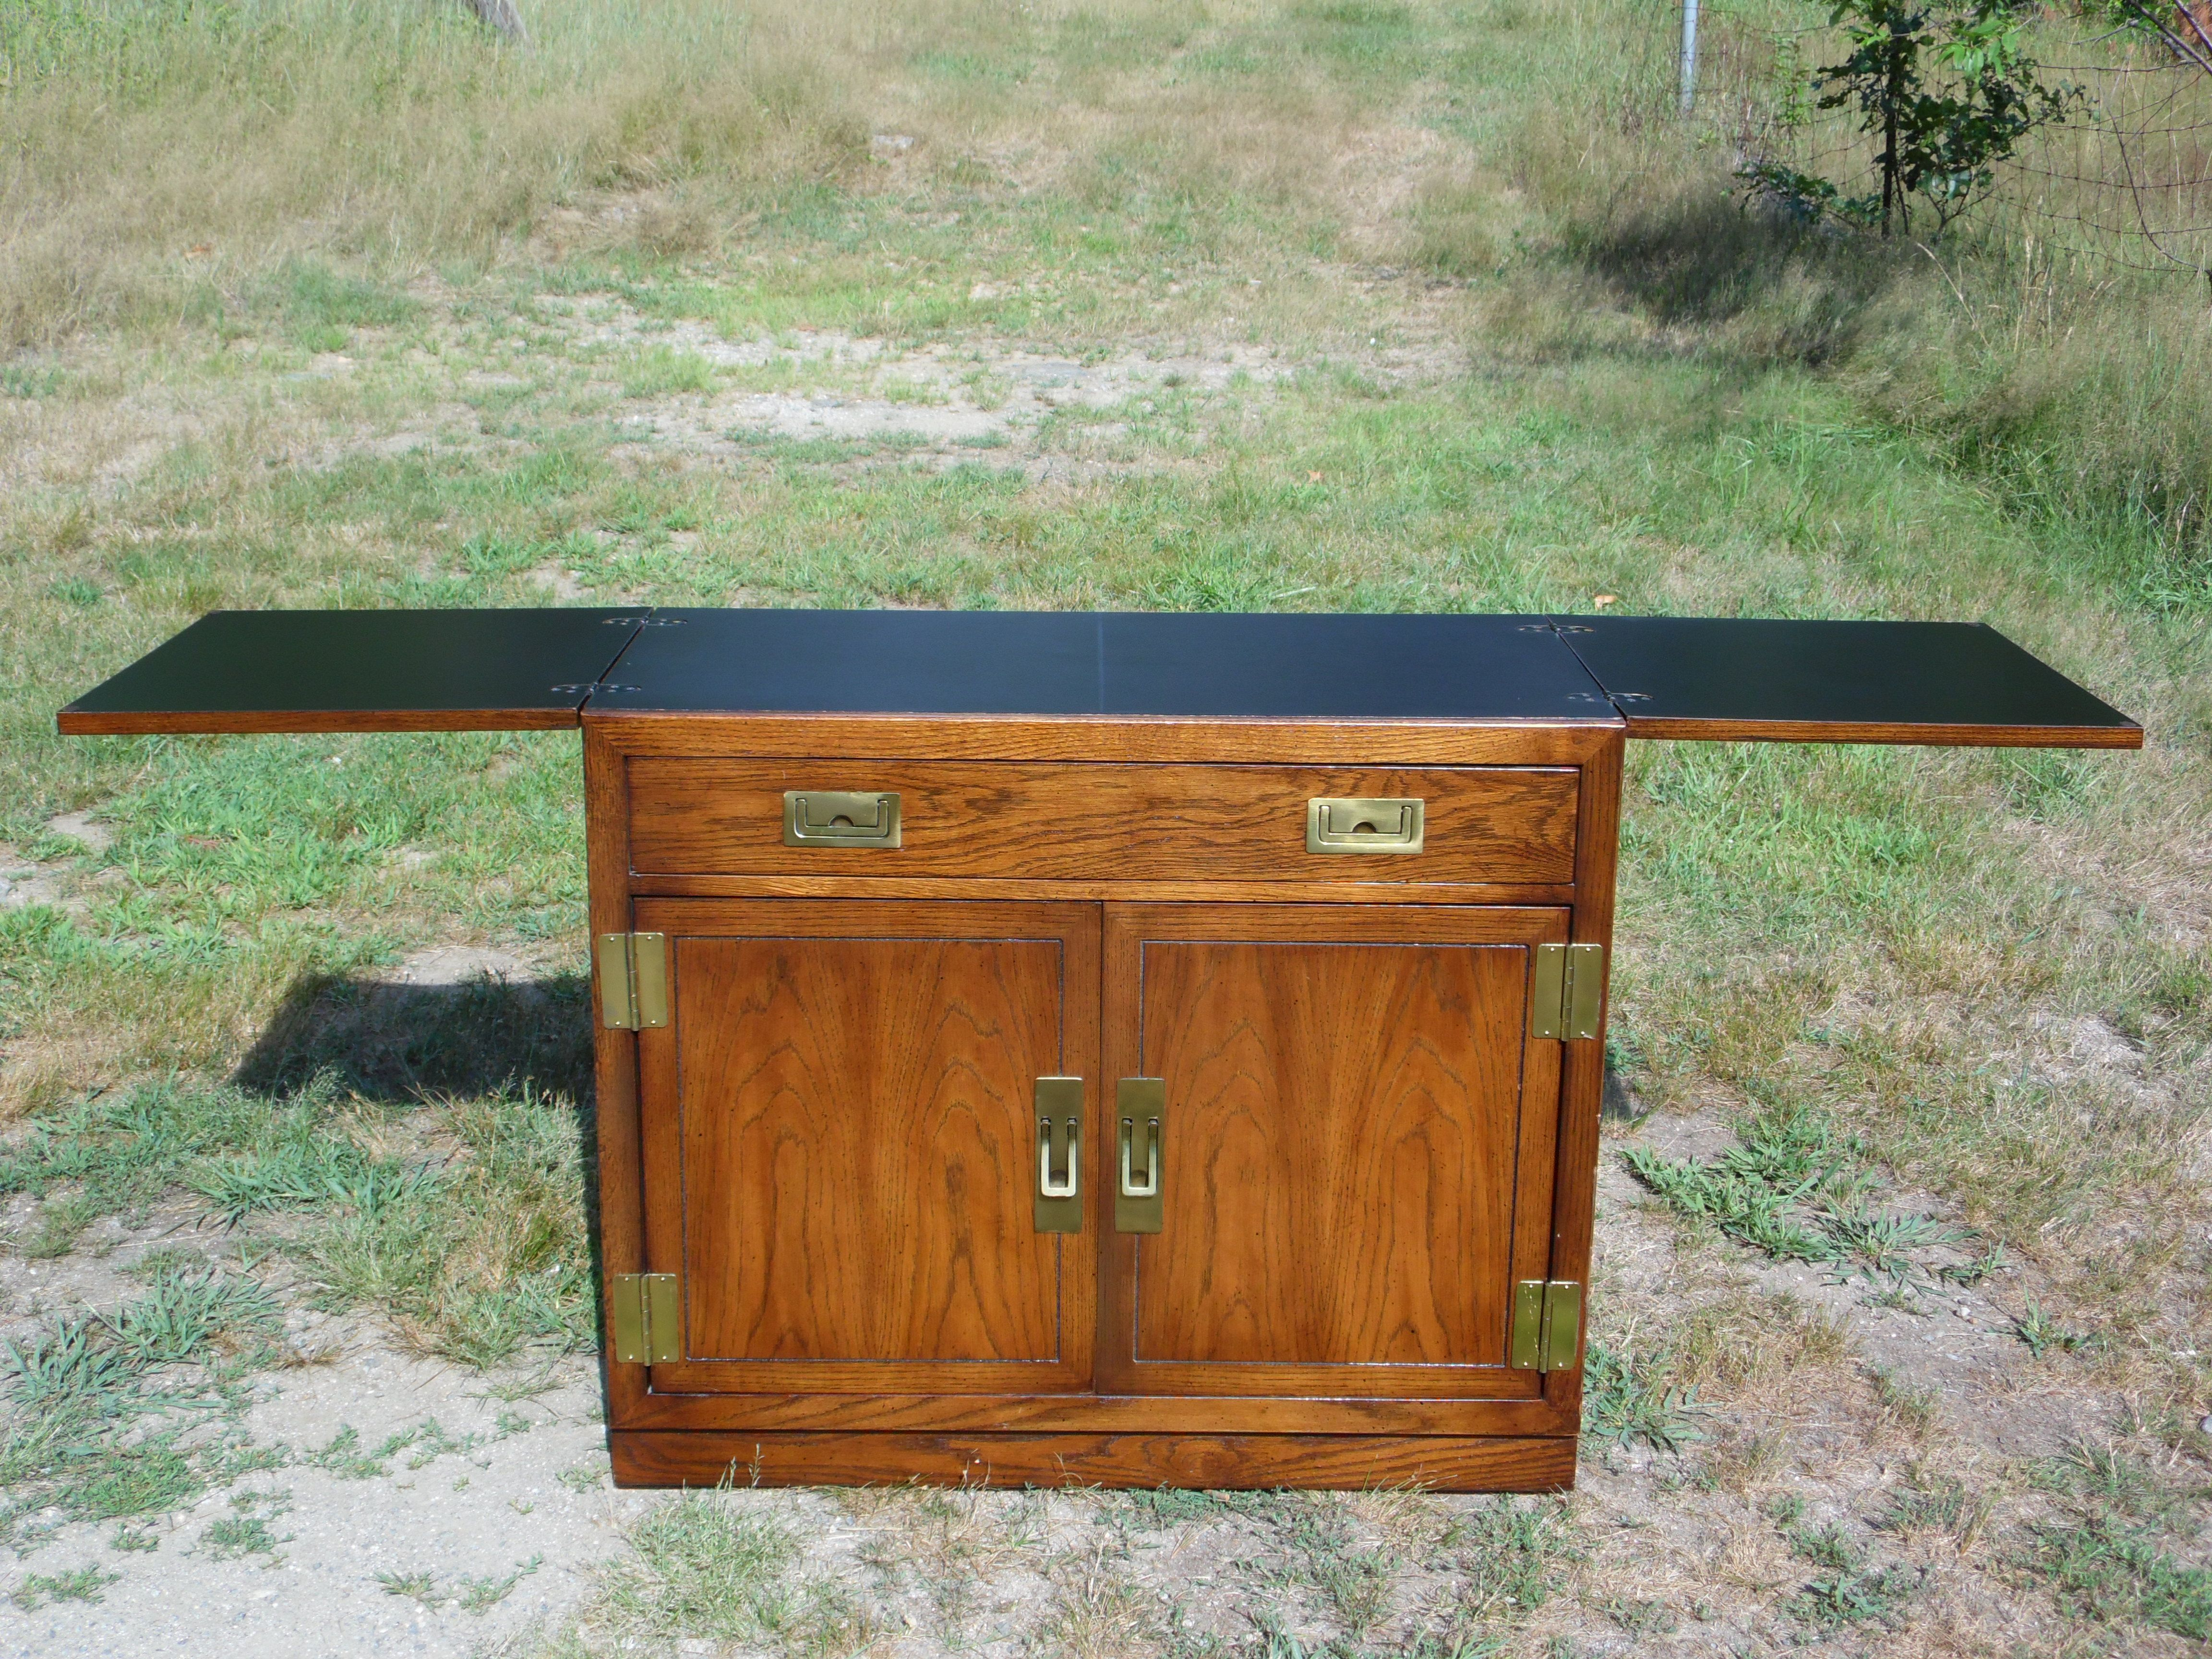 Vintage Dixie Mid Century Modern Campaign Serving Bar Cart Has 2 Extension Leaves That Flip Open